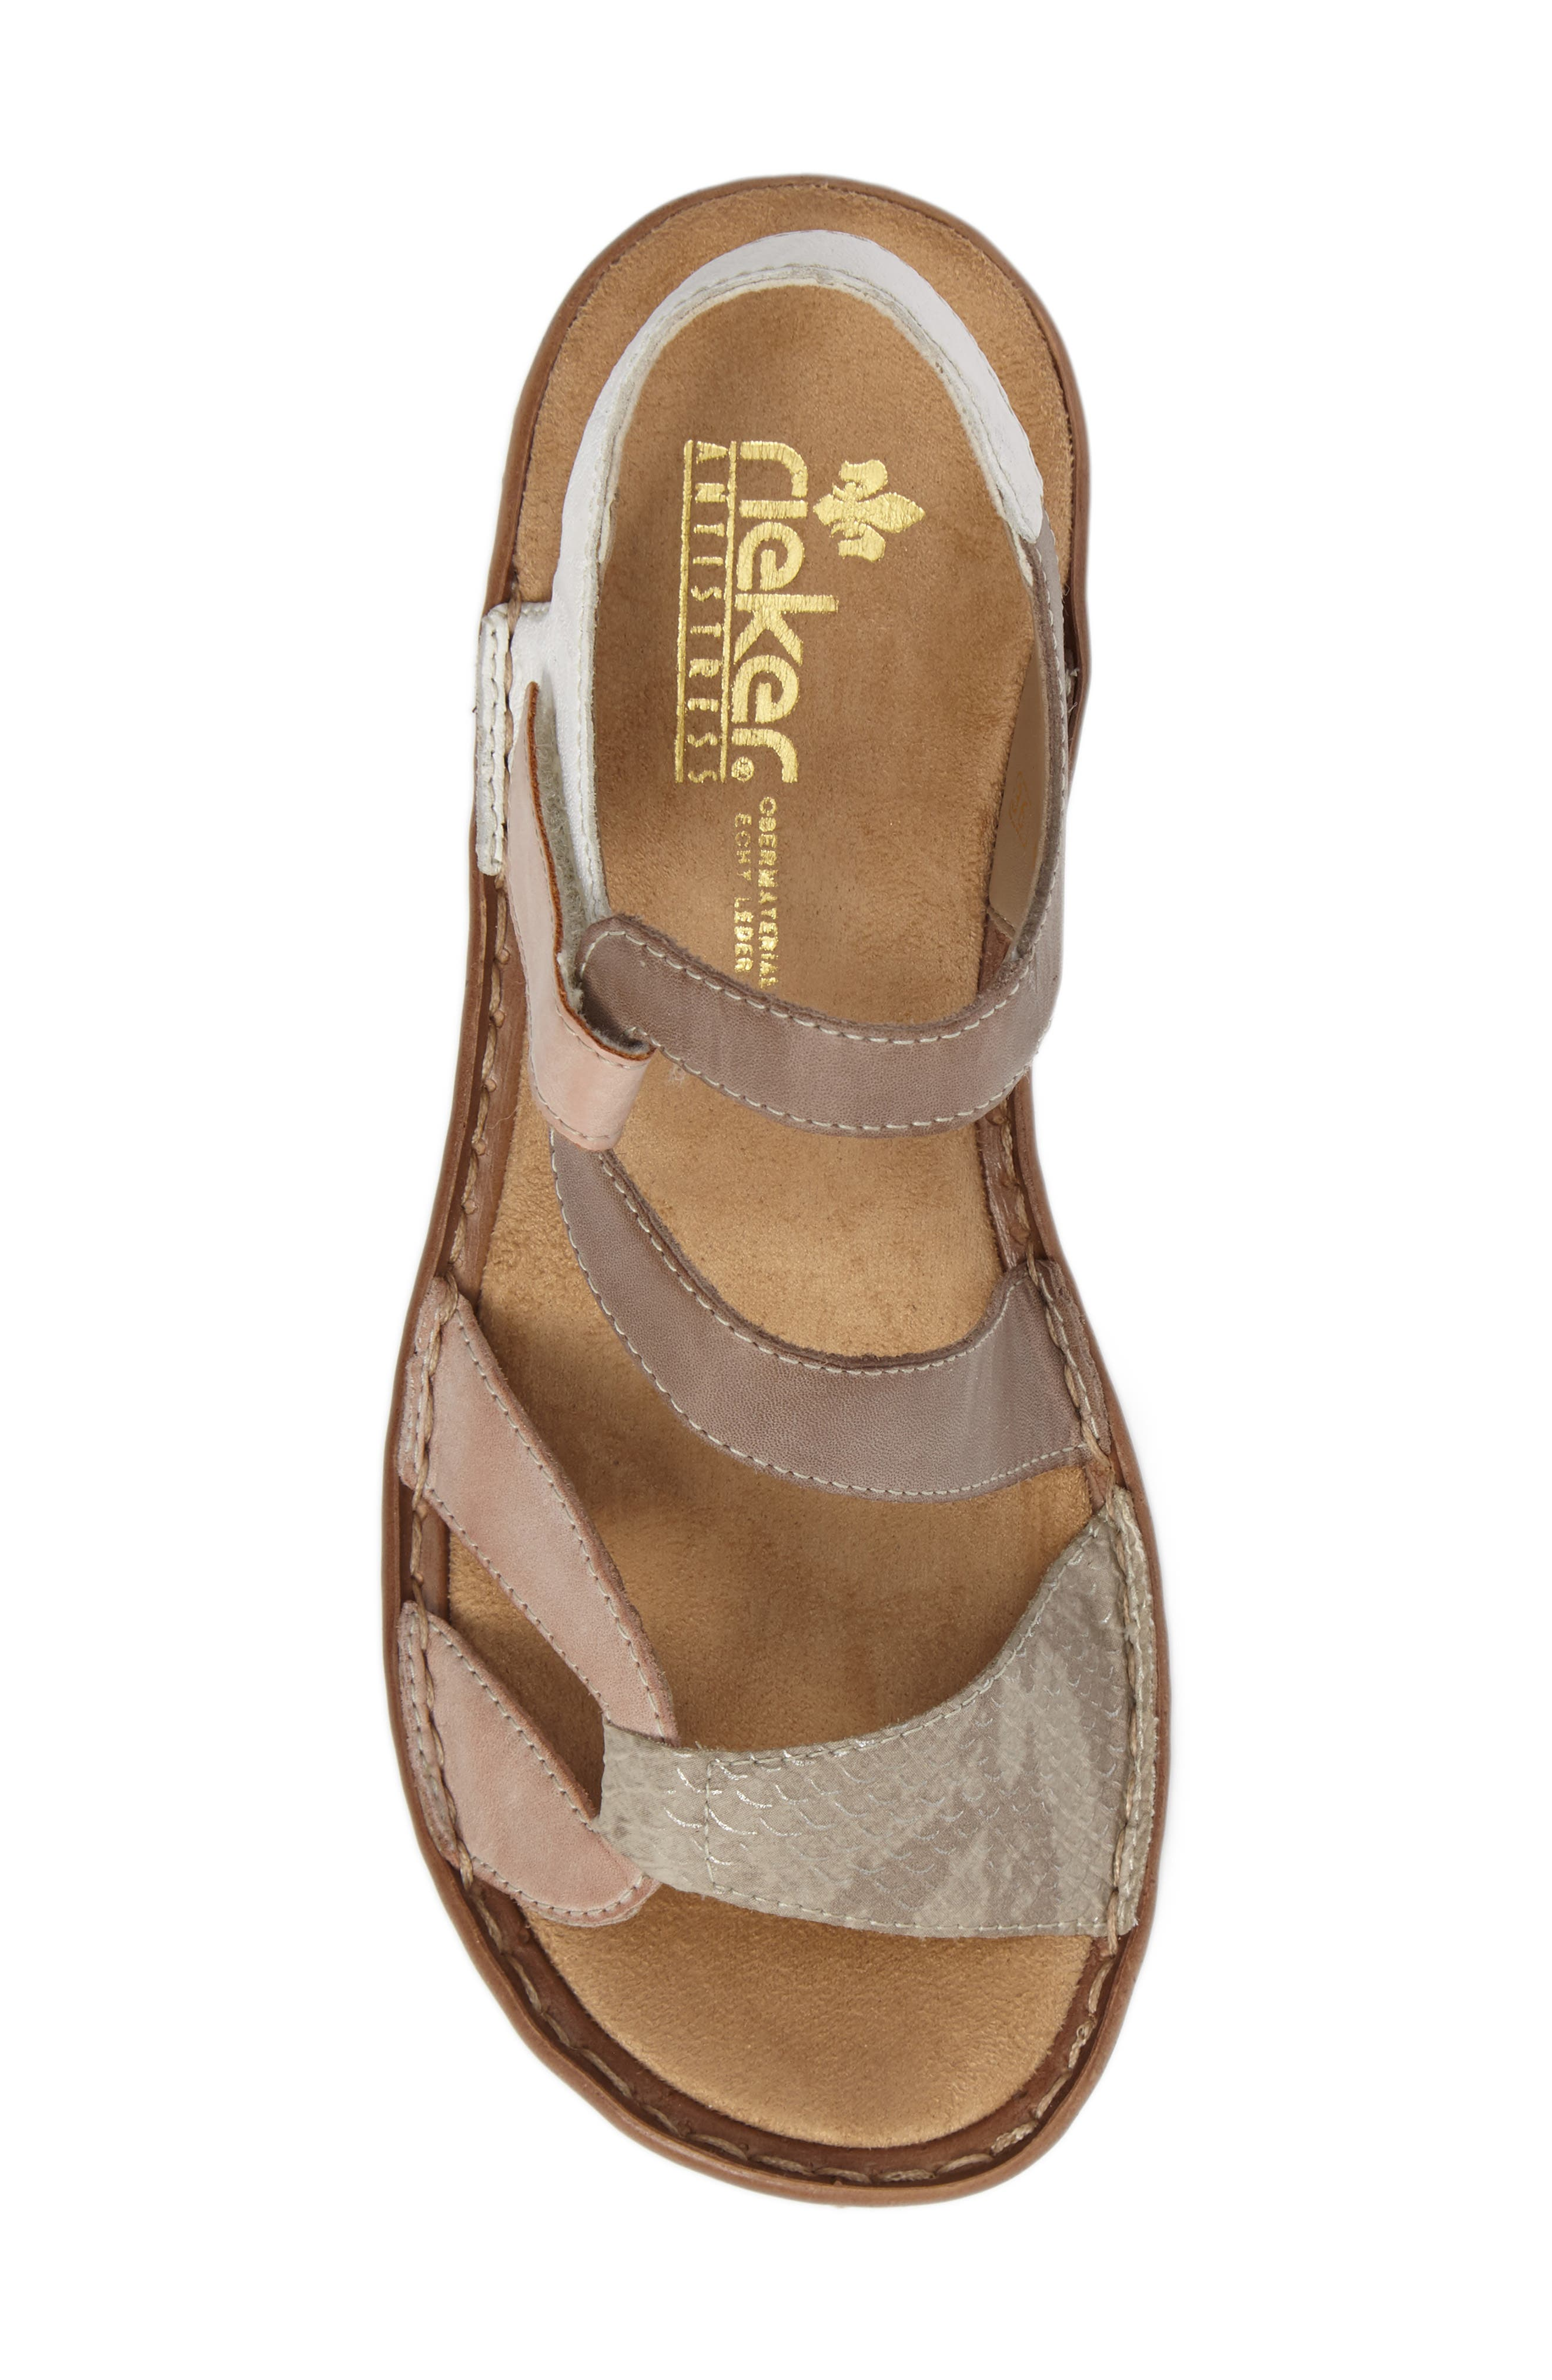 Regina 66 Wedge Sandal,                             Alternate thumbnail 5, color,                             ROSE LEATHER